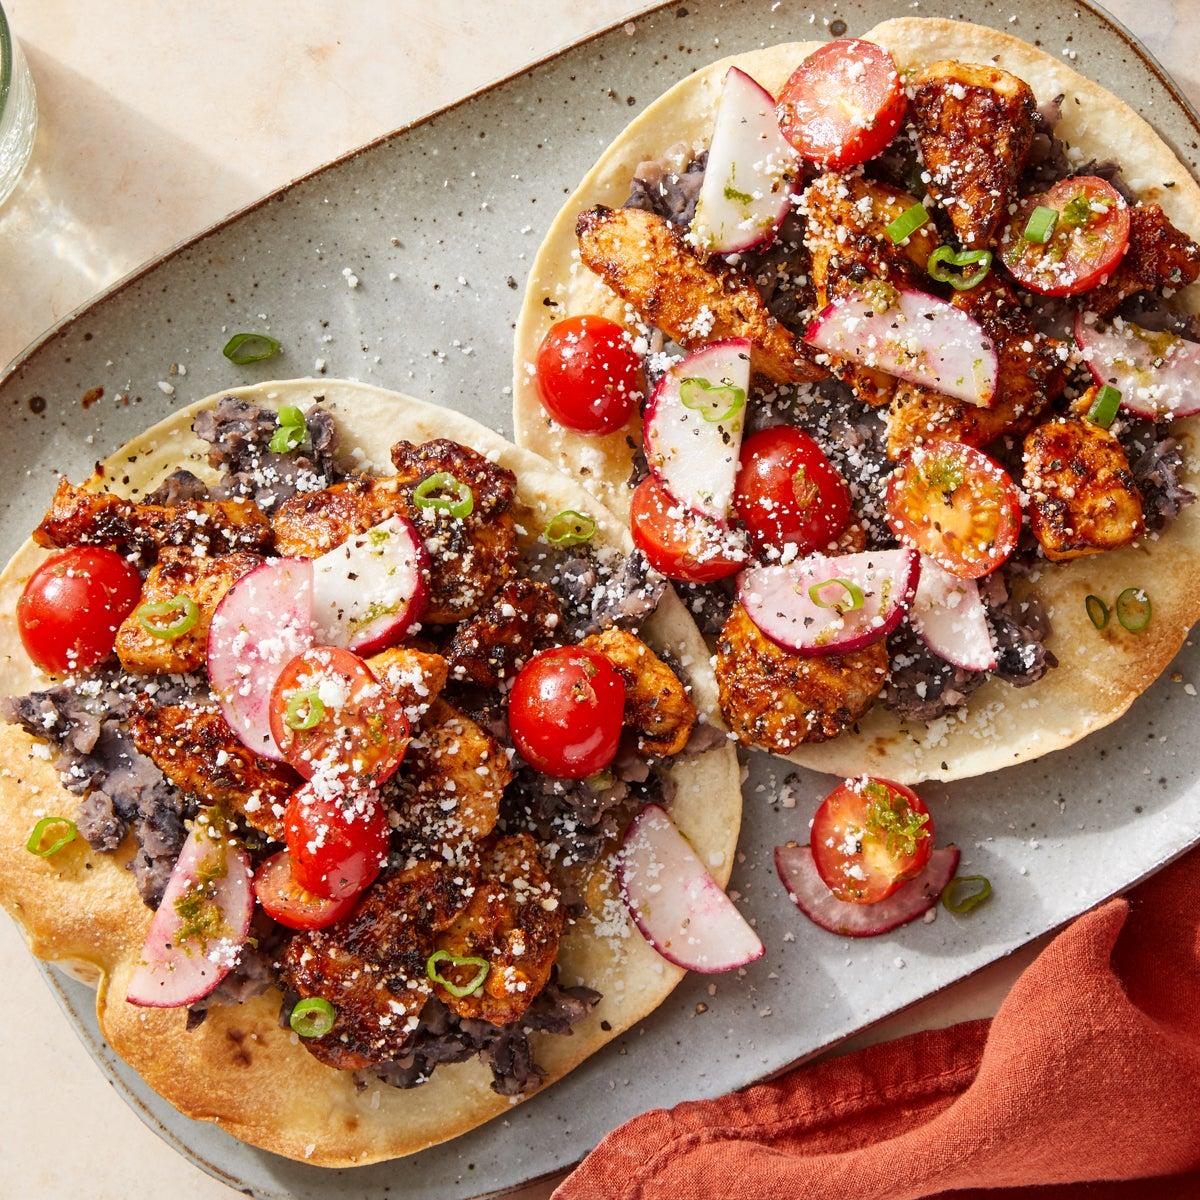 Chipotle Chicken Tostadas with Black Bean Mash & Tomato-Radish Salsa